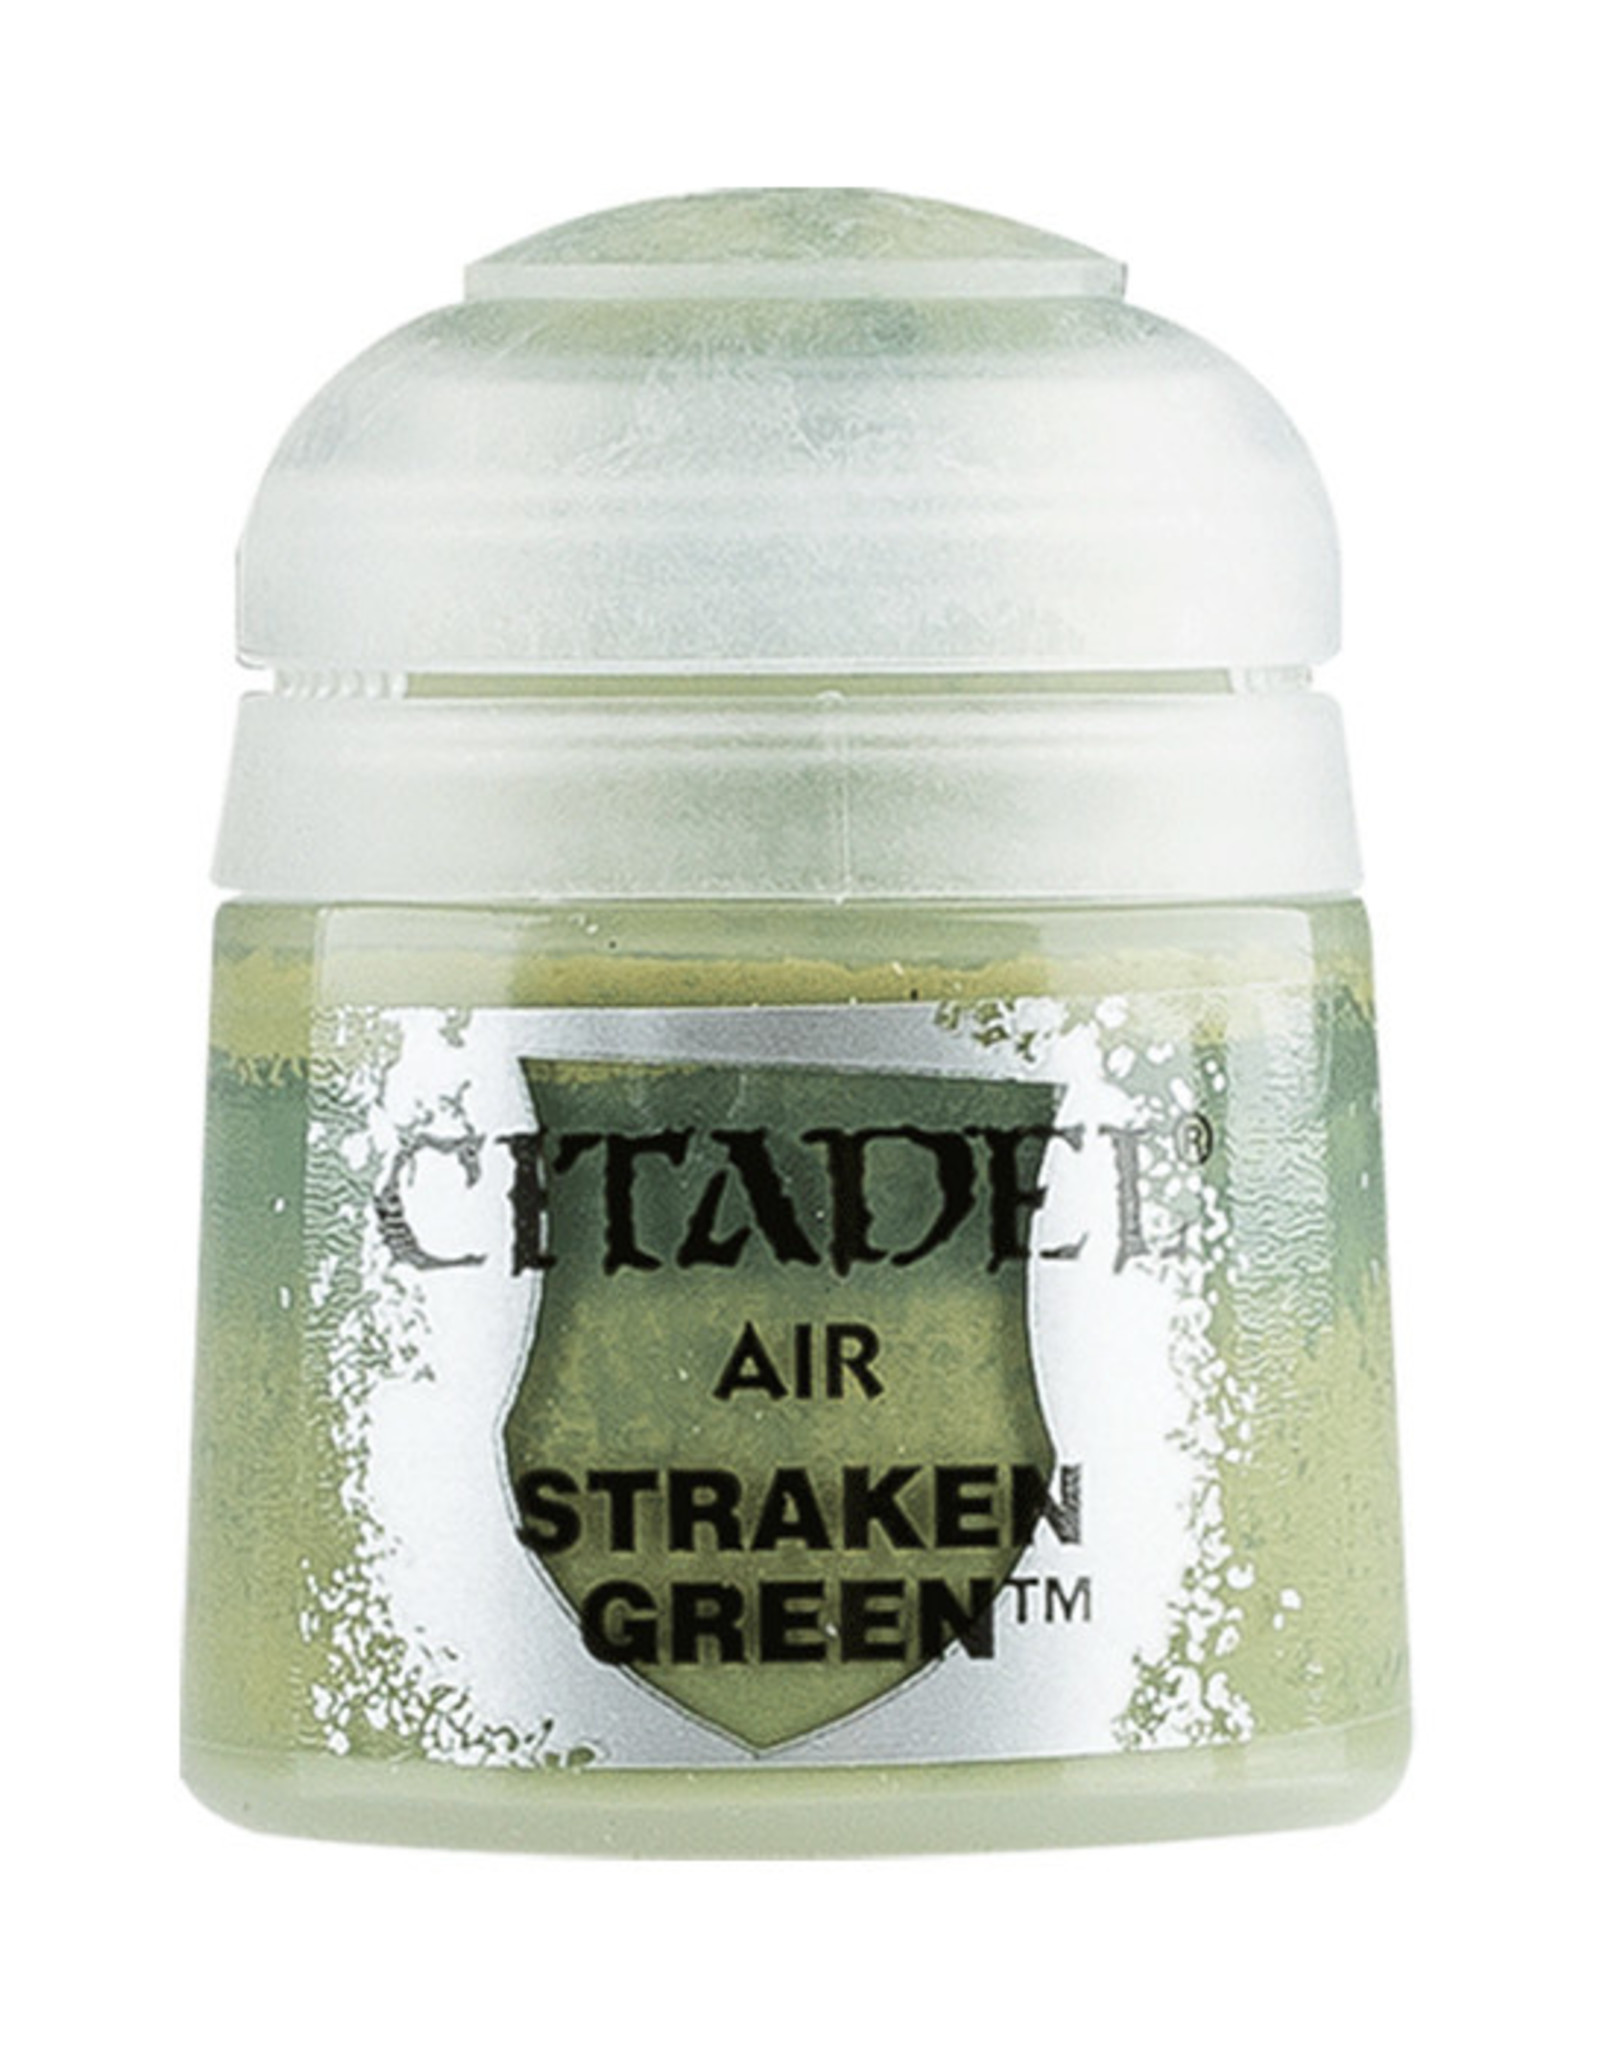 Citadel Citadel Colour: Air - Straken Green